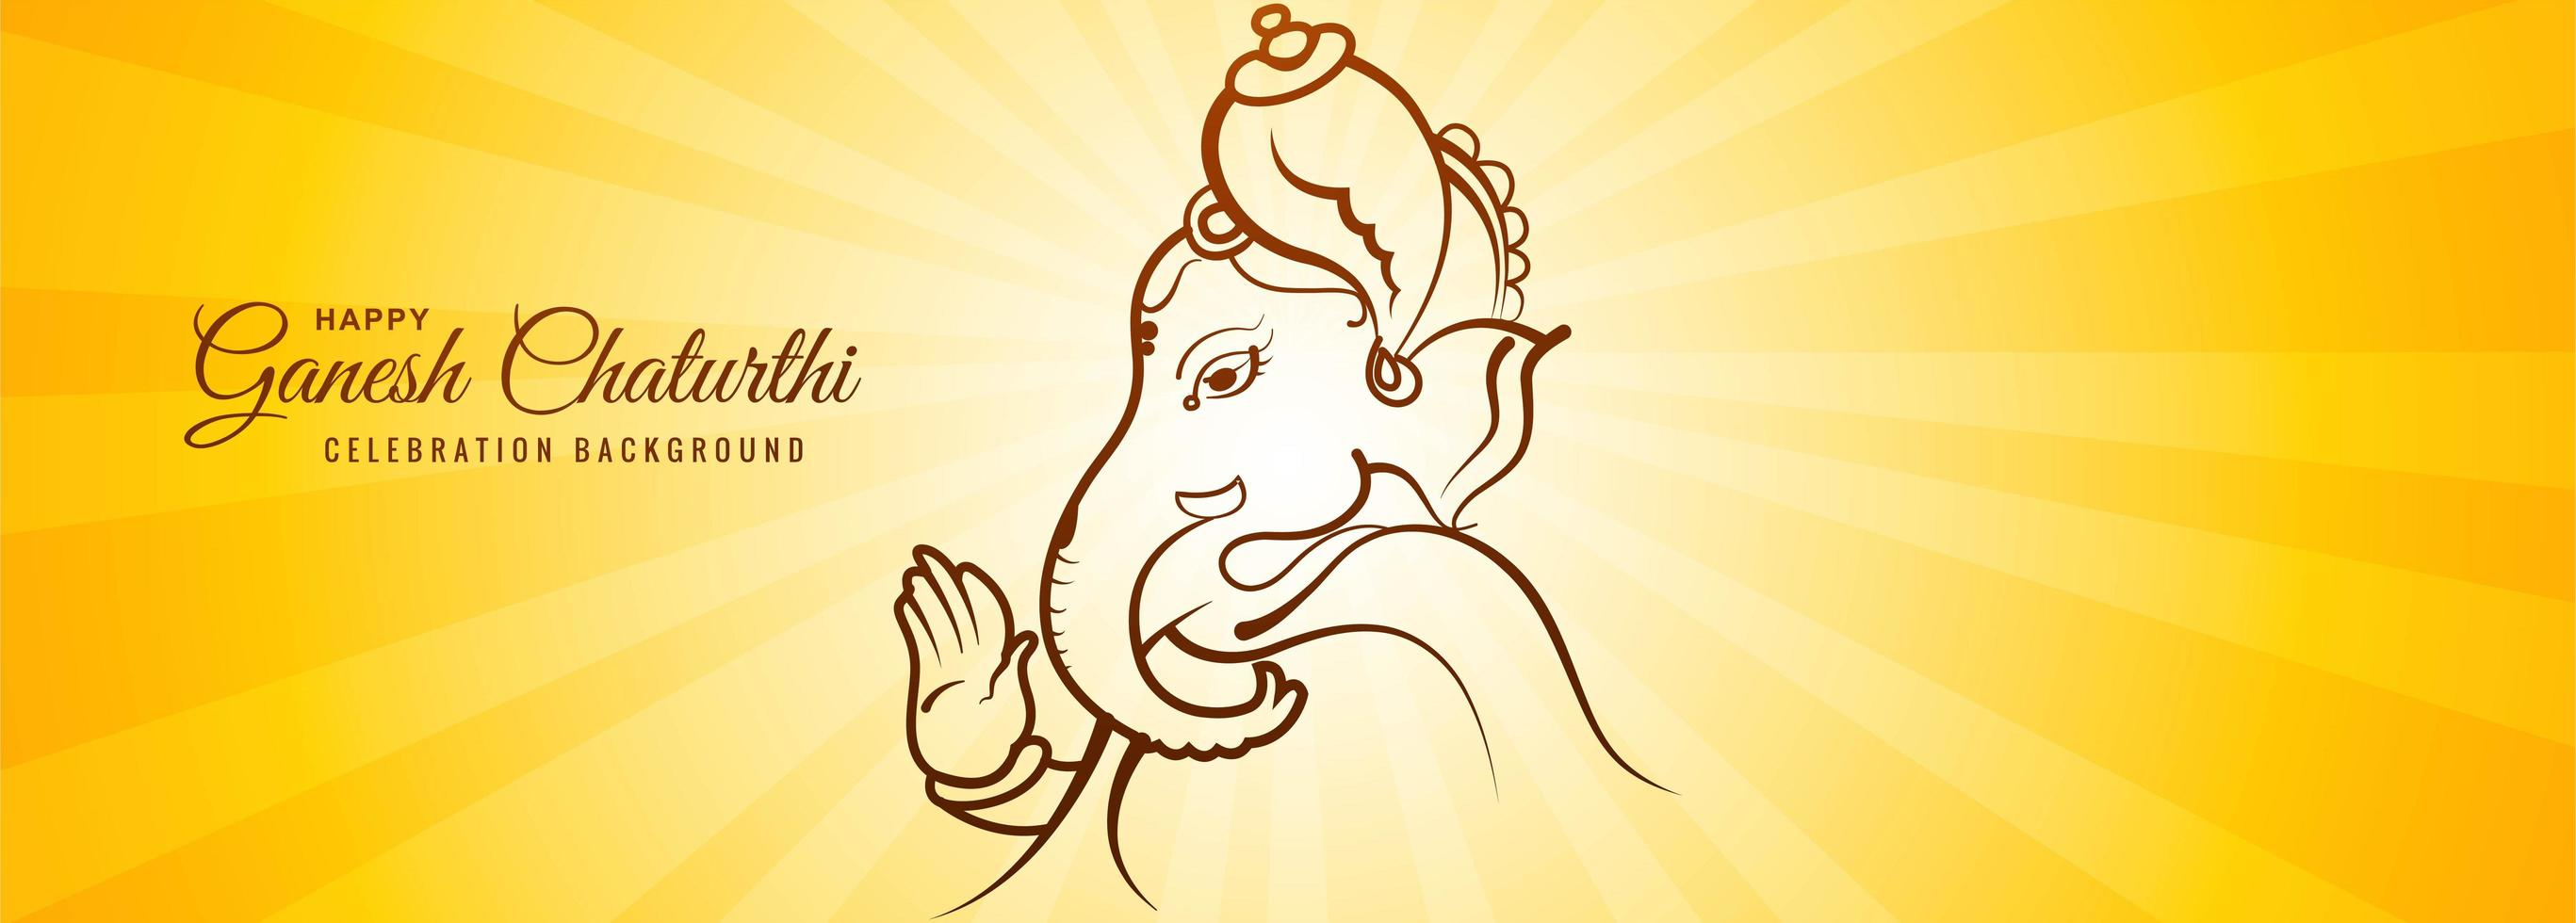 Lord Ganesha Light Ray for Ganesh Chaturthi Card Banner vector